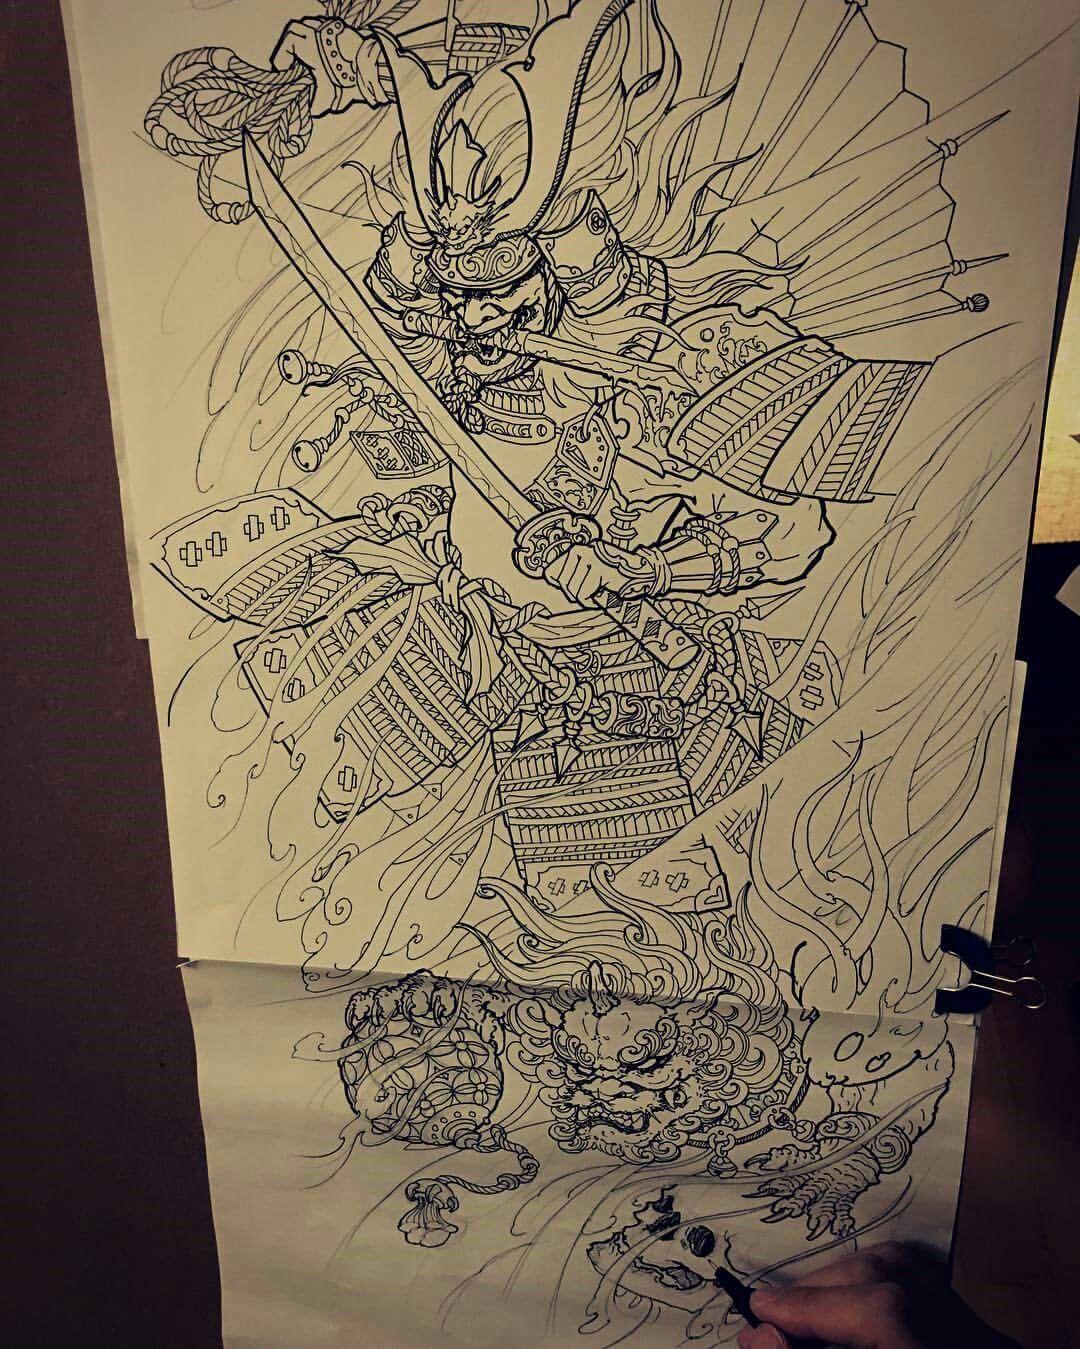 pingl par qu c sang ng sur t ng h nh x m pinterest samourai tatouages et dessin tatouage. Black Bedroom Furniture Sets. Home Design Ideas